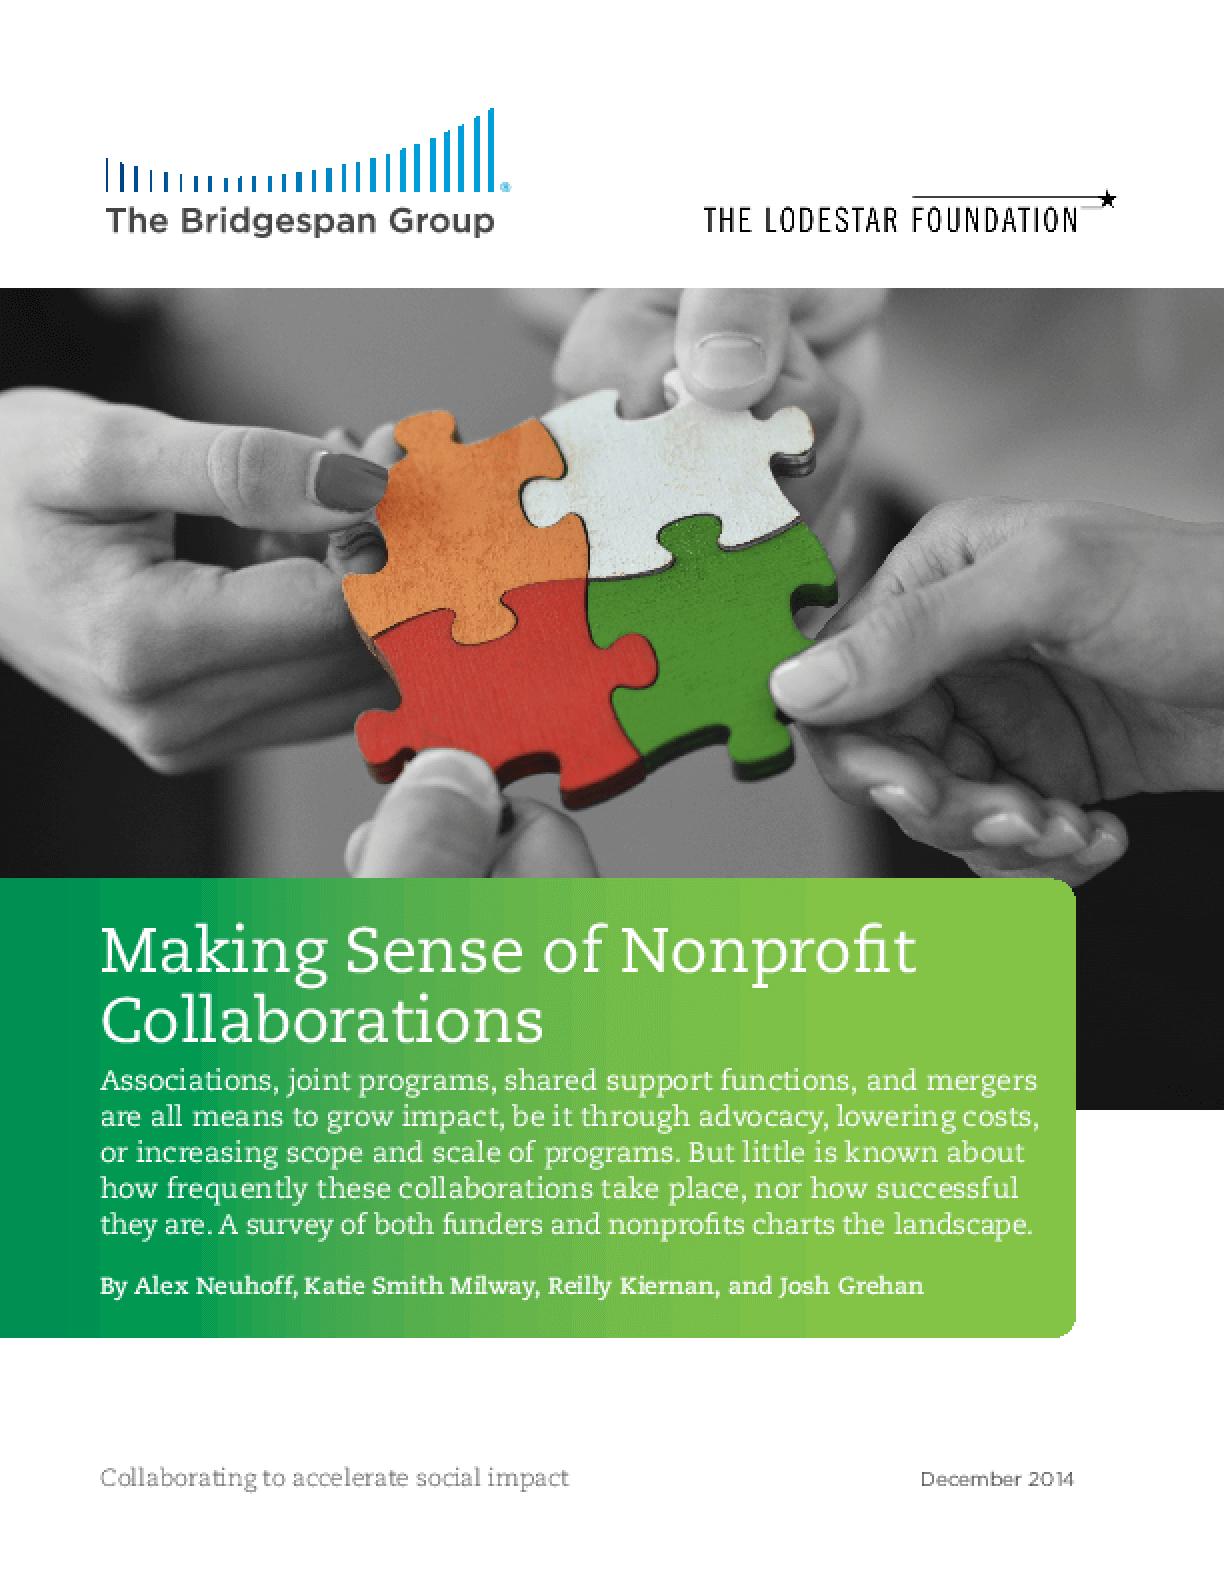 Making Sense of Nonprofit Collaborations